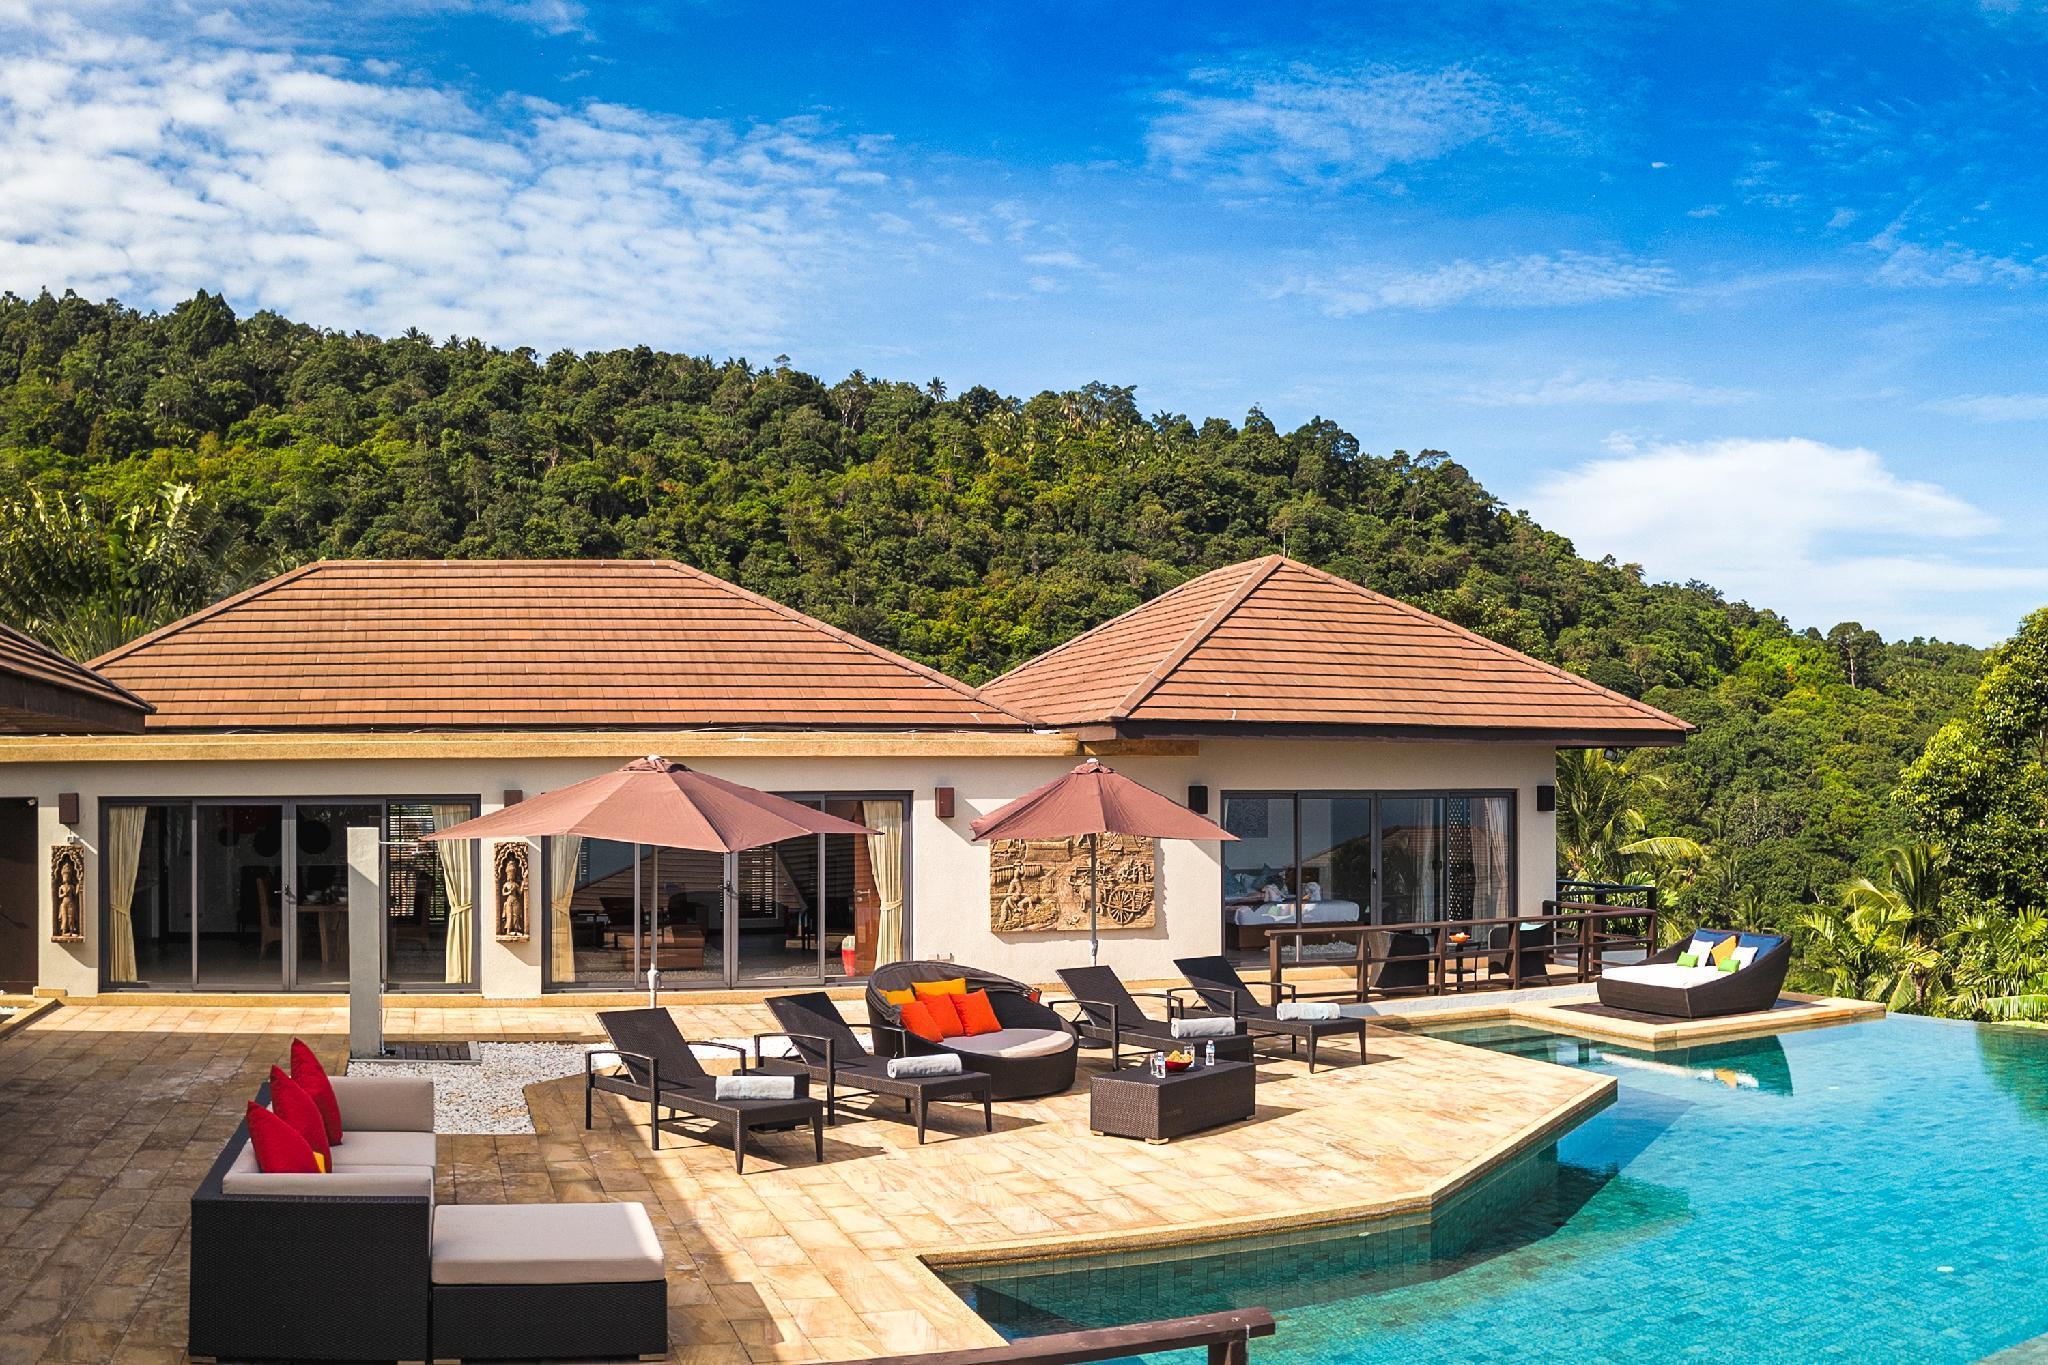 5 Bedroom Sea View Villa Bubbles - with chef วิลลา 5 ห้องนอน 5 ห้องน้ำส่วนตัว ขนาด 800 ตร.ม. – บางปอ